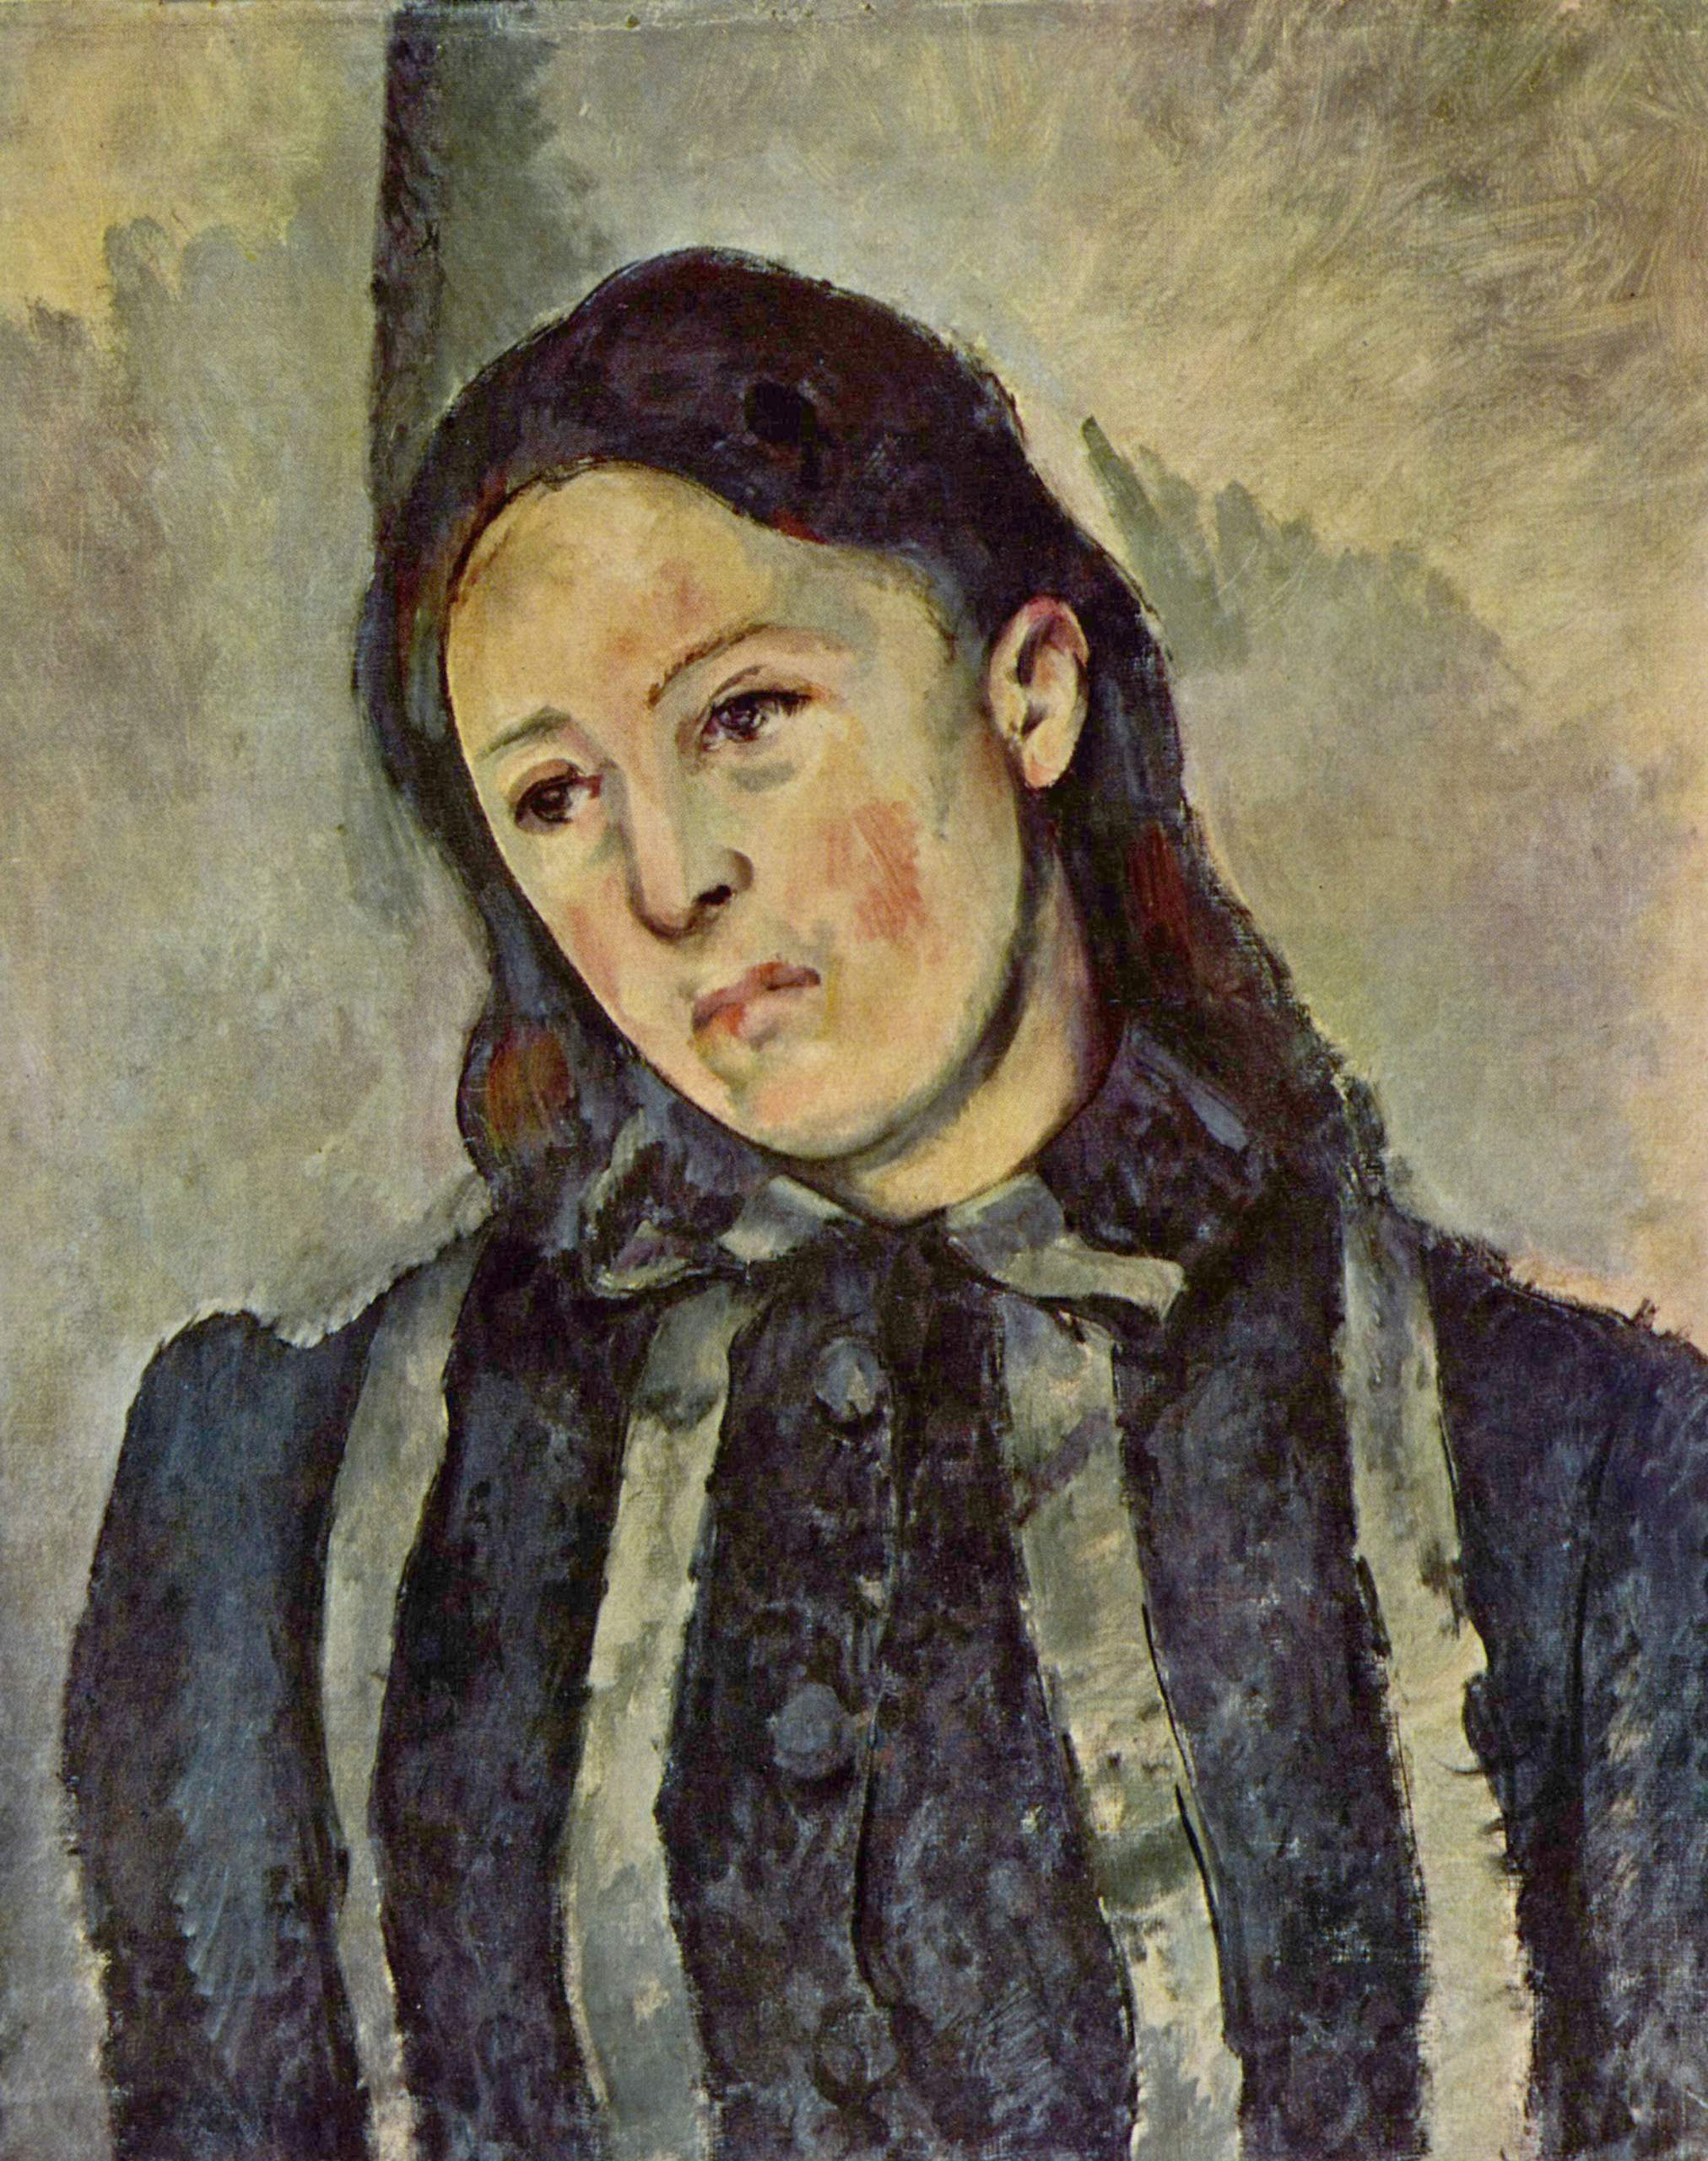 Paul Cézanne,  Portrait of Madame Cézanne with Loosened Hair , 1883-1887, Philadelphia Museum of Art.